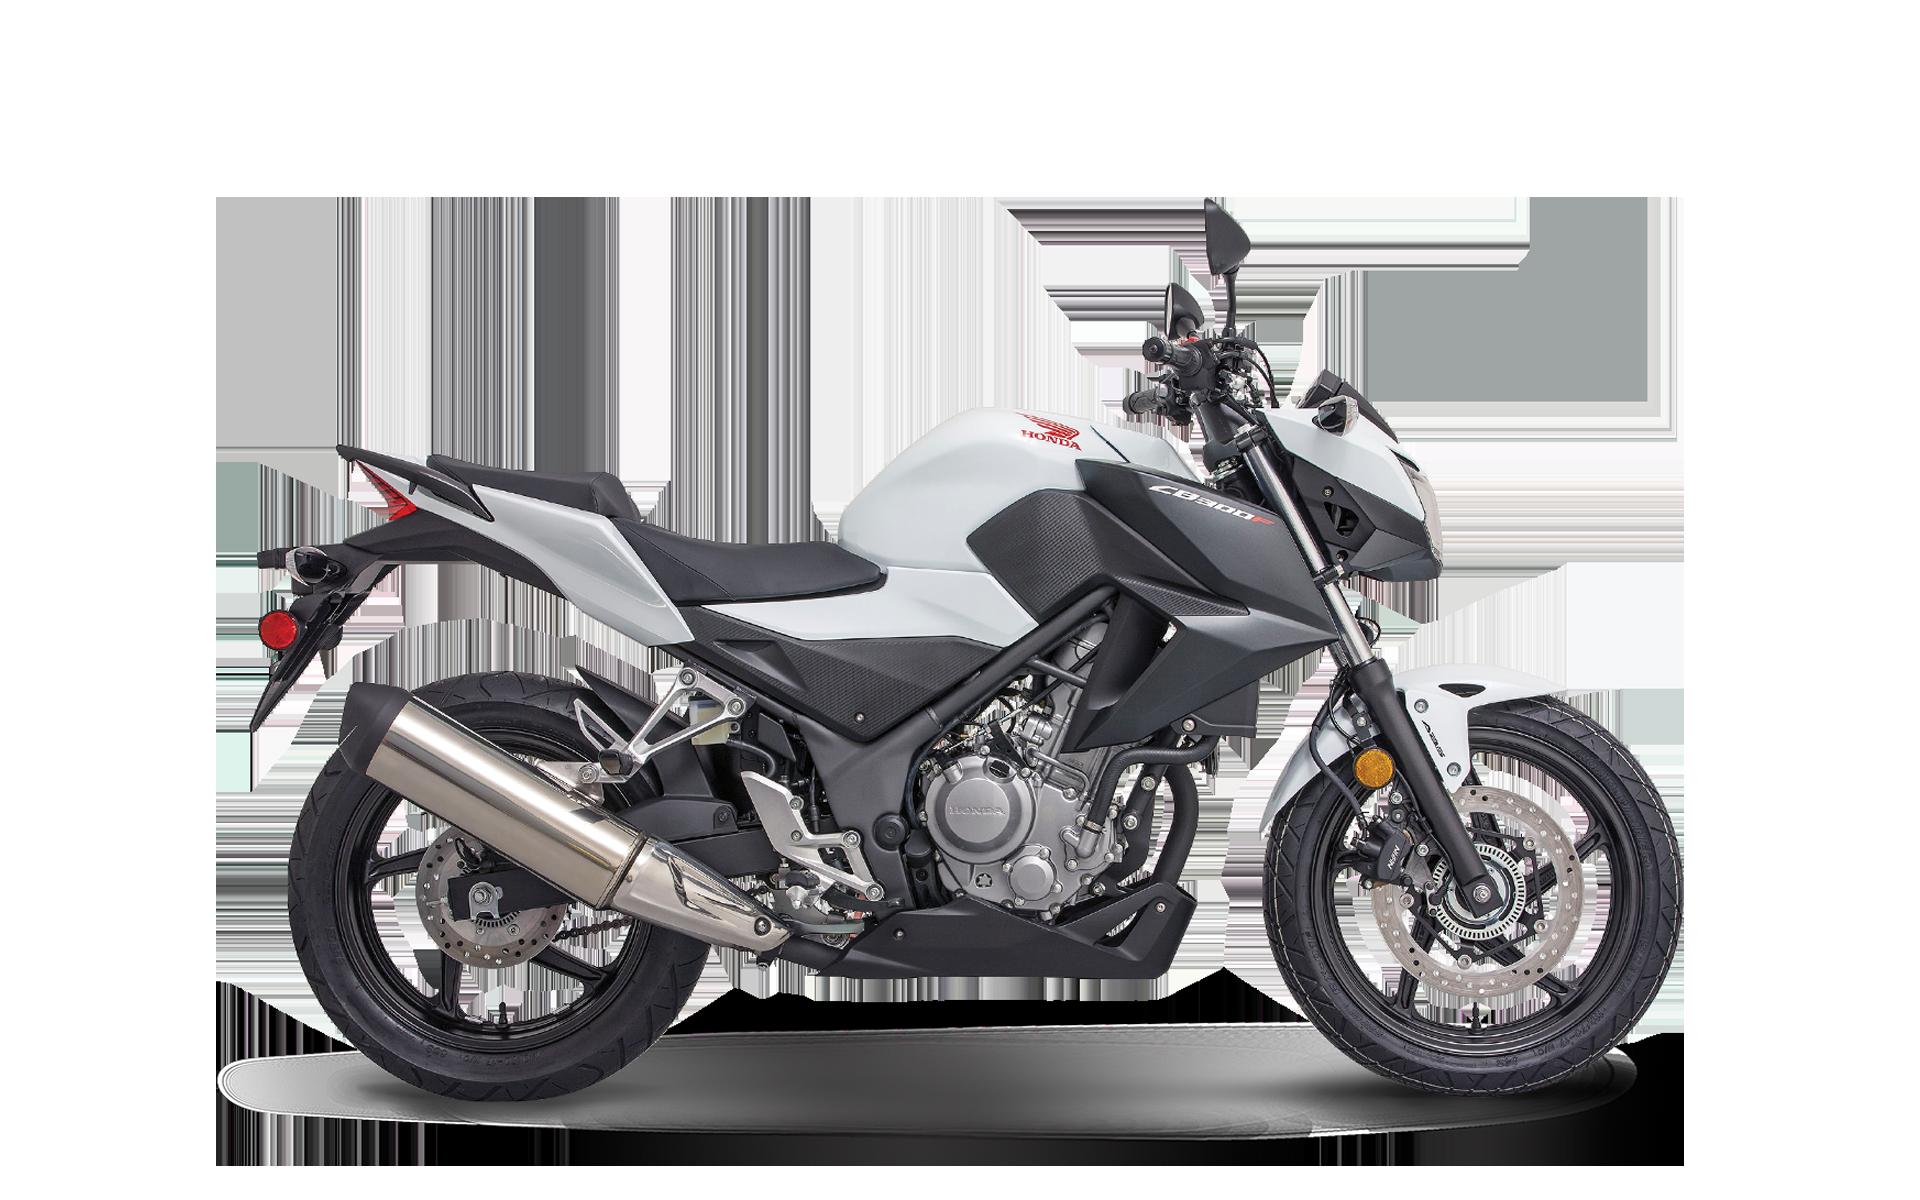 Honda CB300R 2019 Black White PNG Image